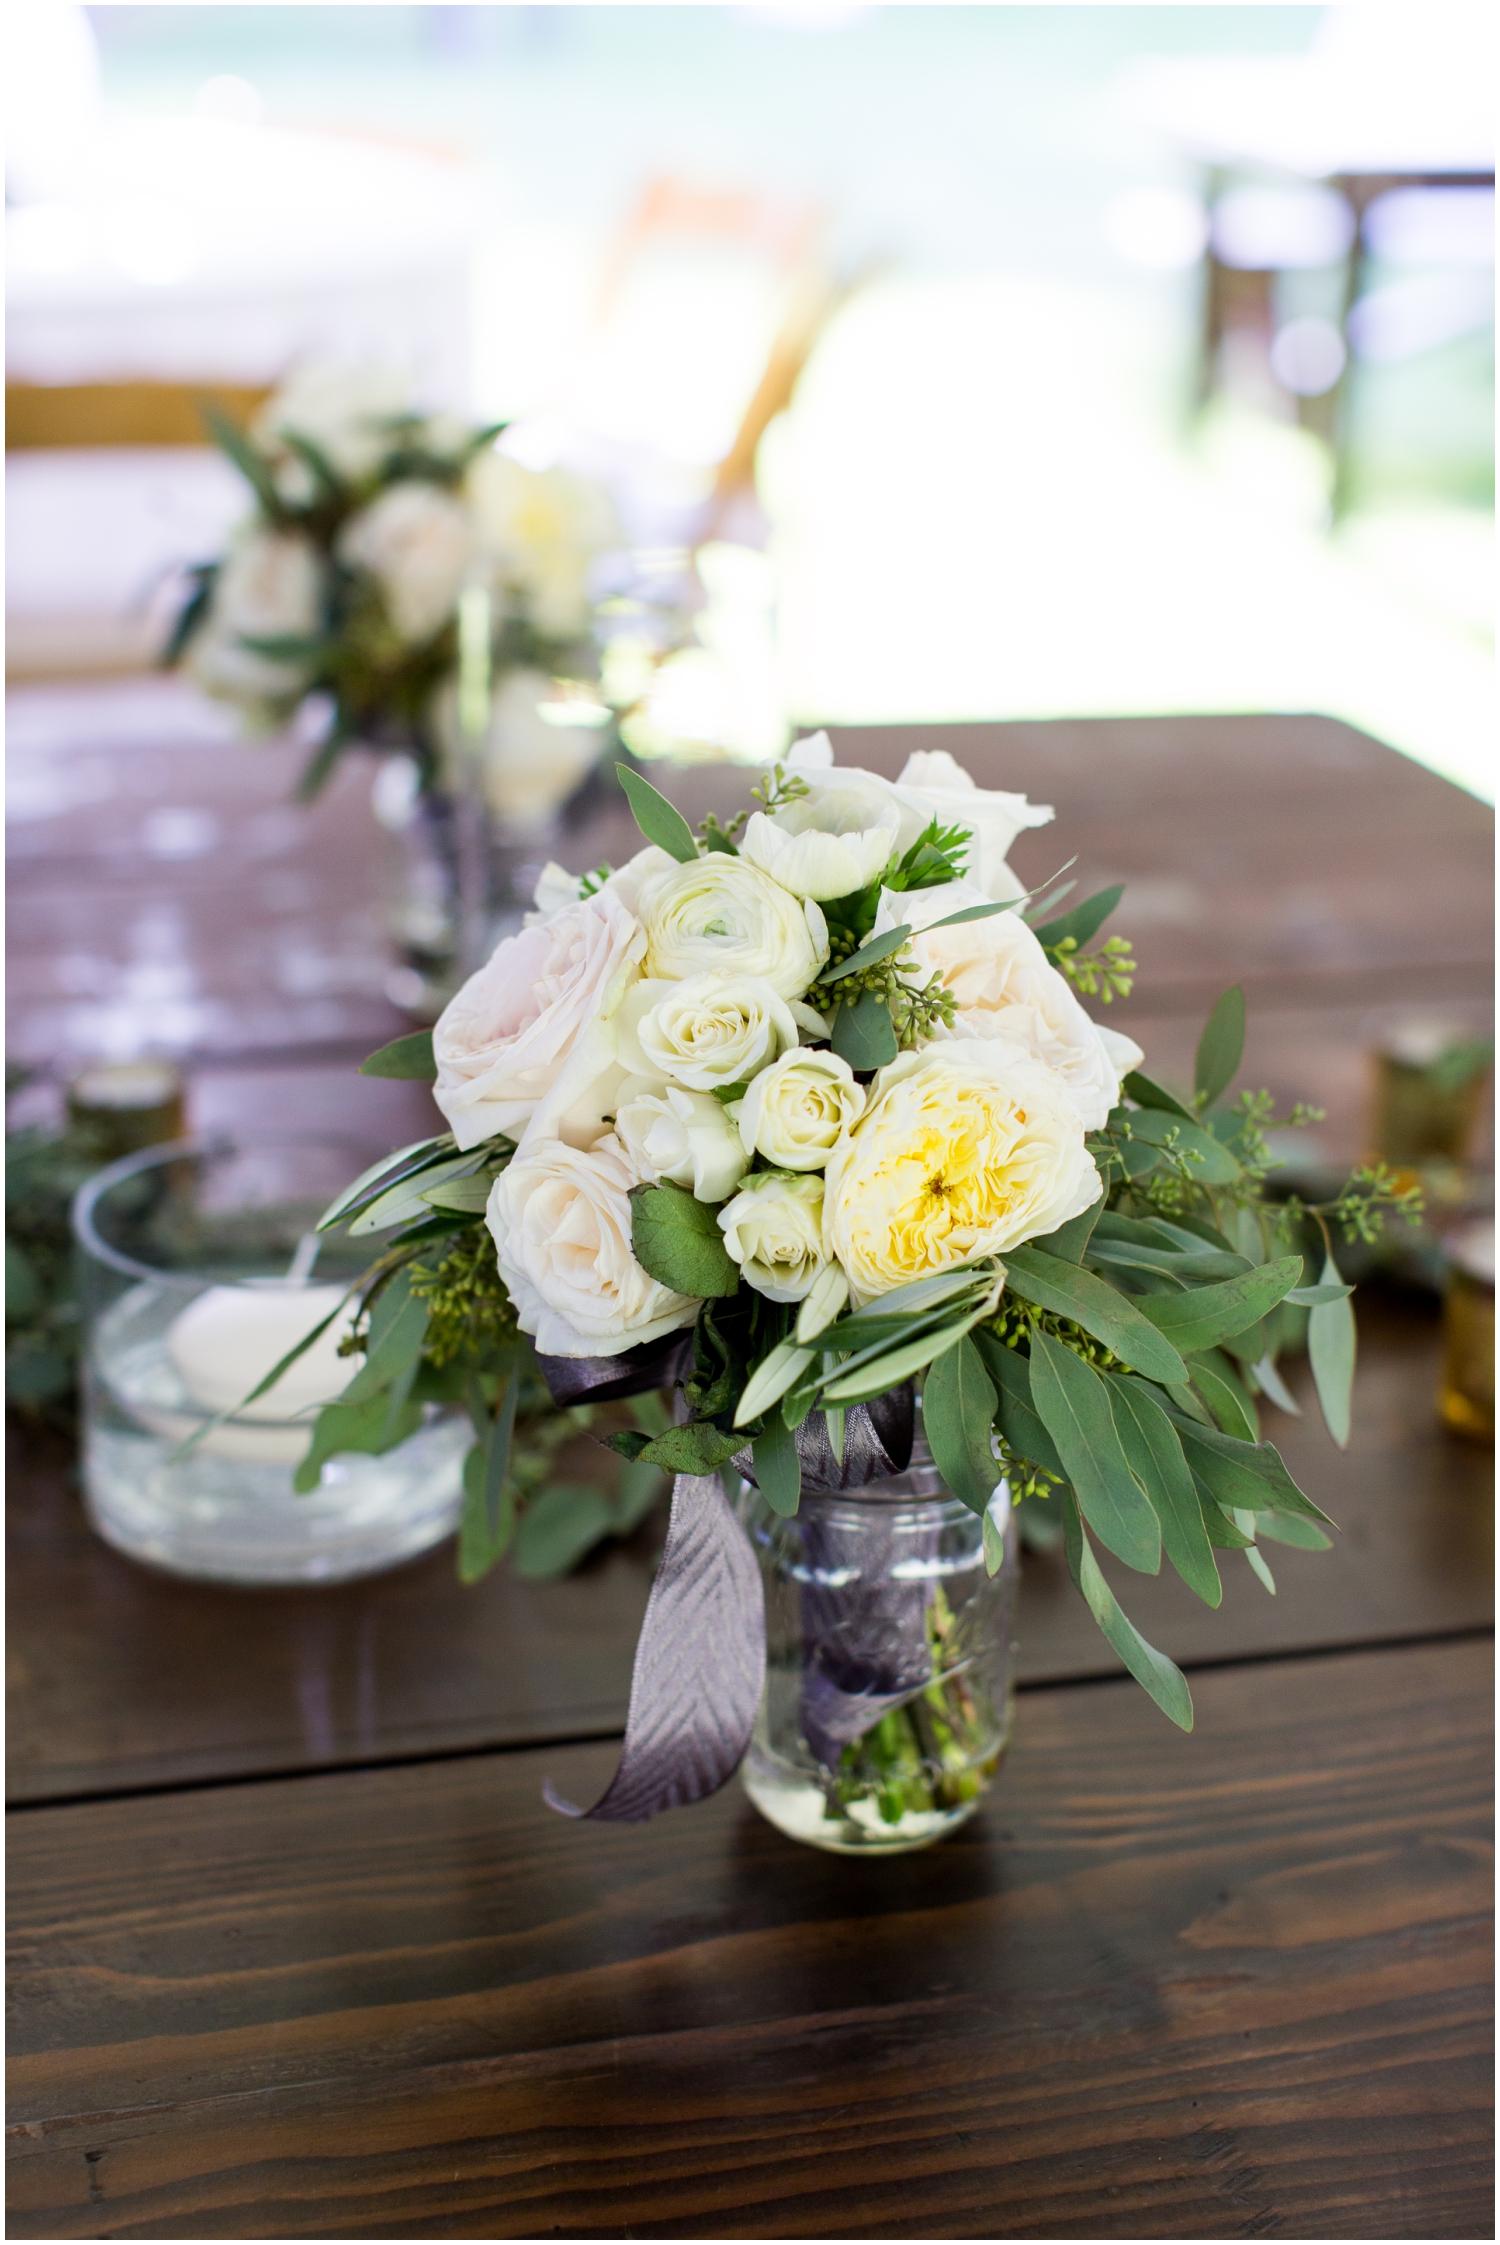 Outdoor wedding centerpiece floral